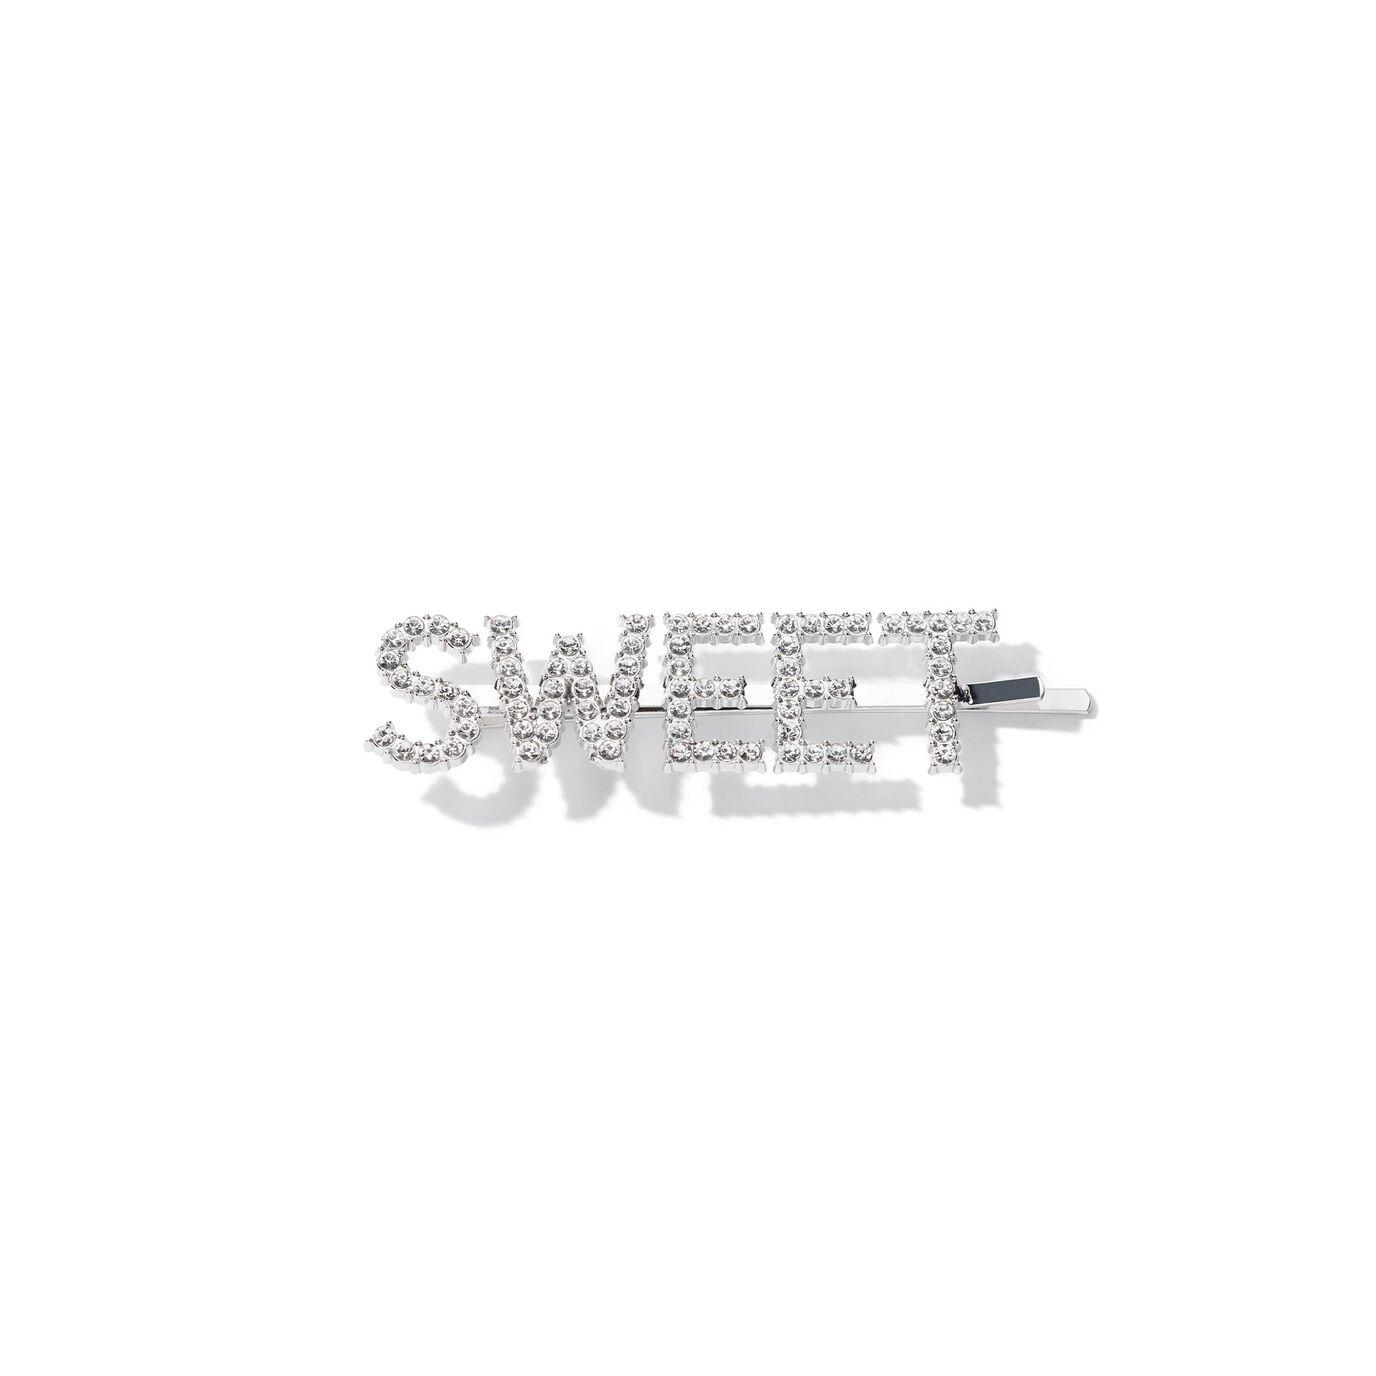 ABH Glam Hairpins - Silver Rhinestone Sweet